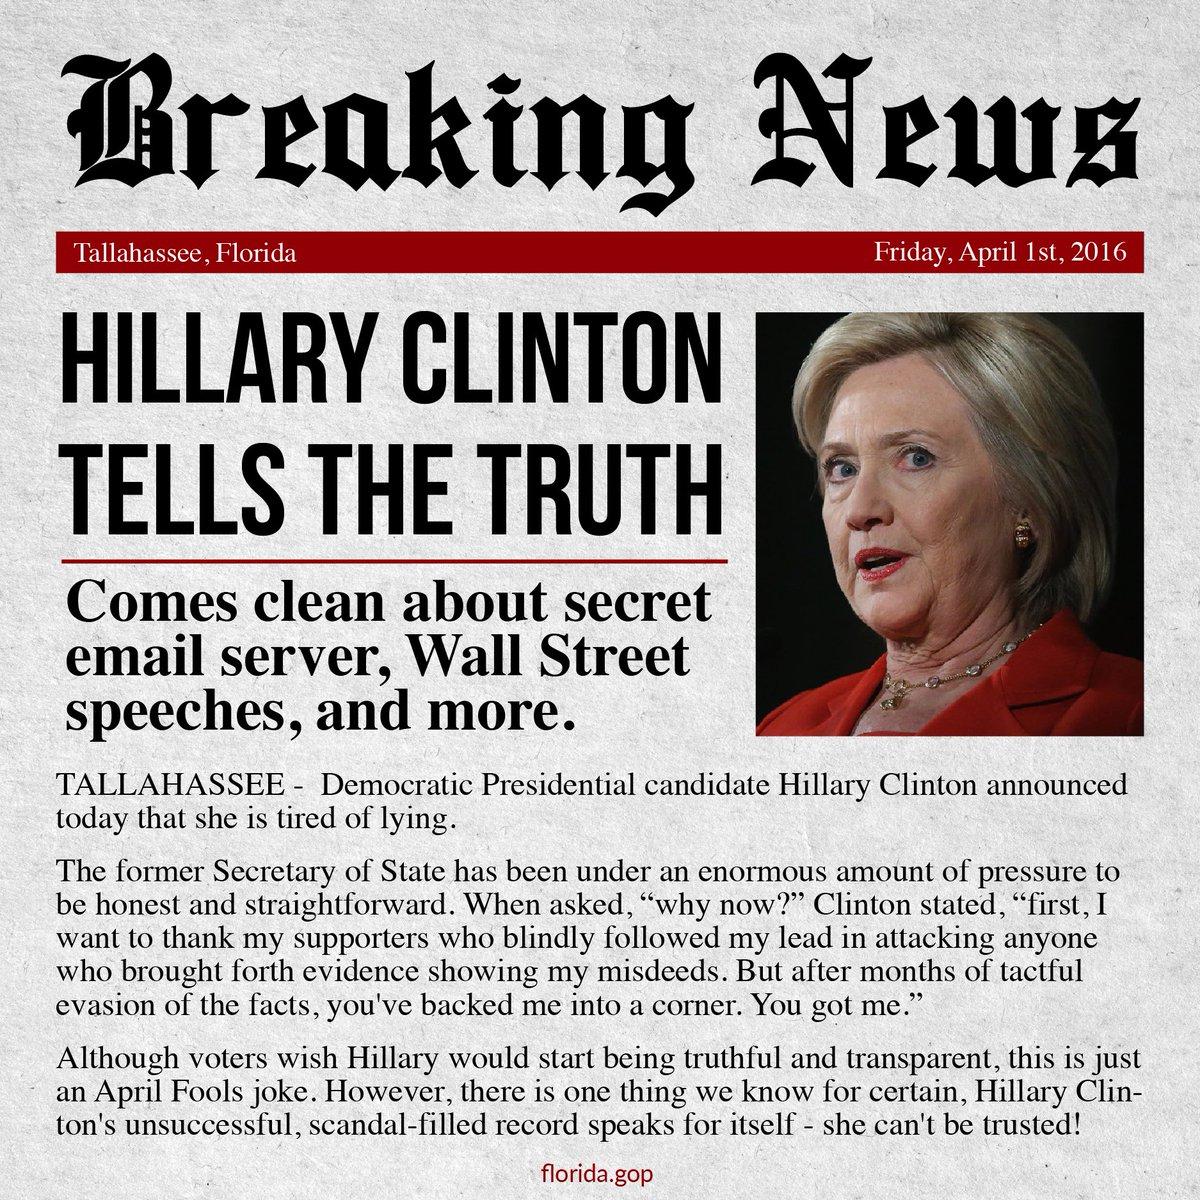 BREAKING NEWS: @HillaryClinton tells the truth! #sayfie https://t.co/XRJ7PtgzSU